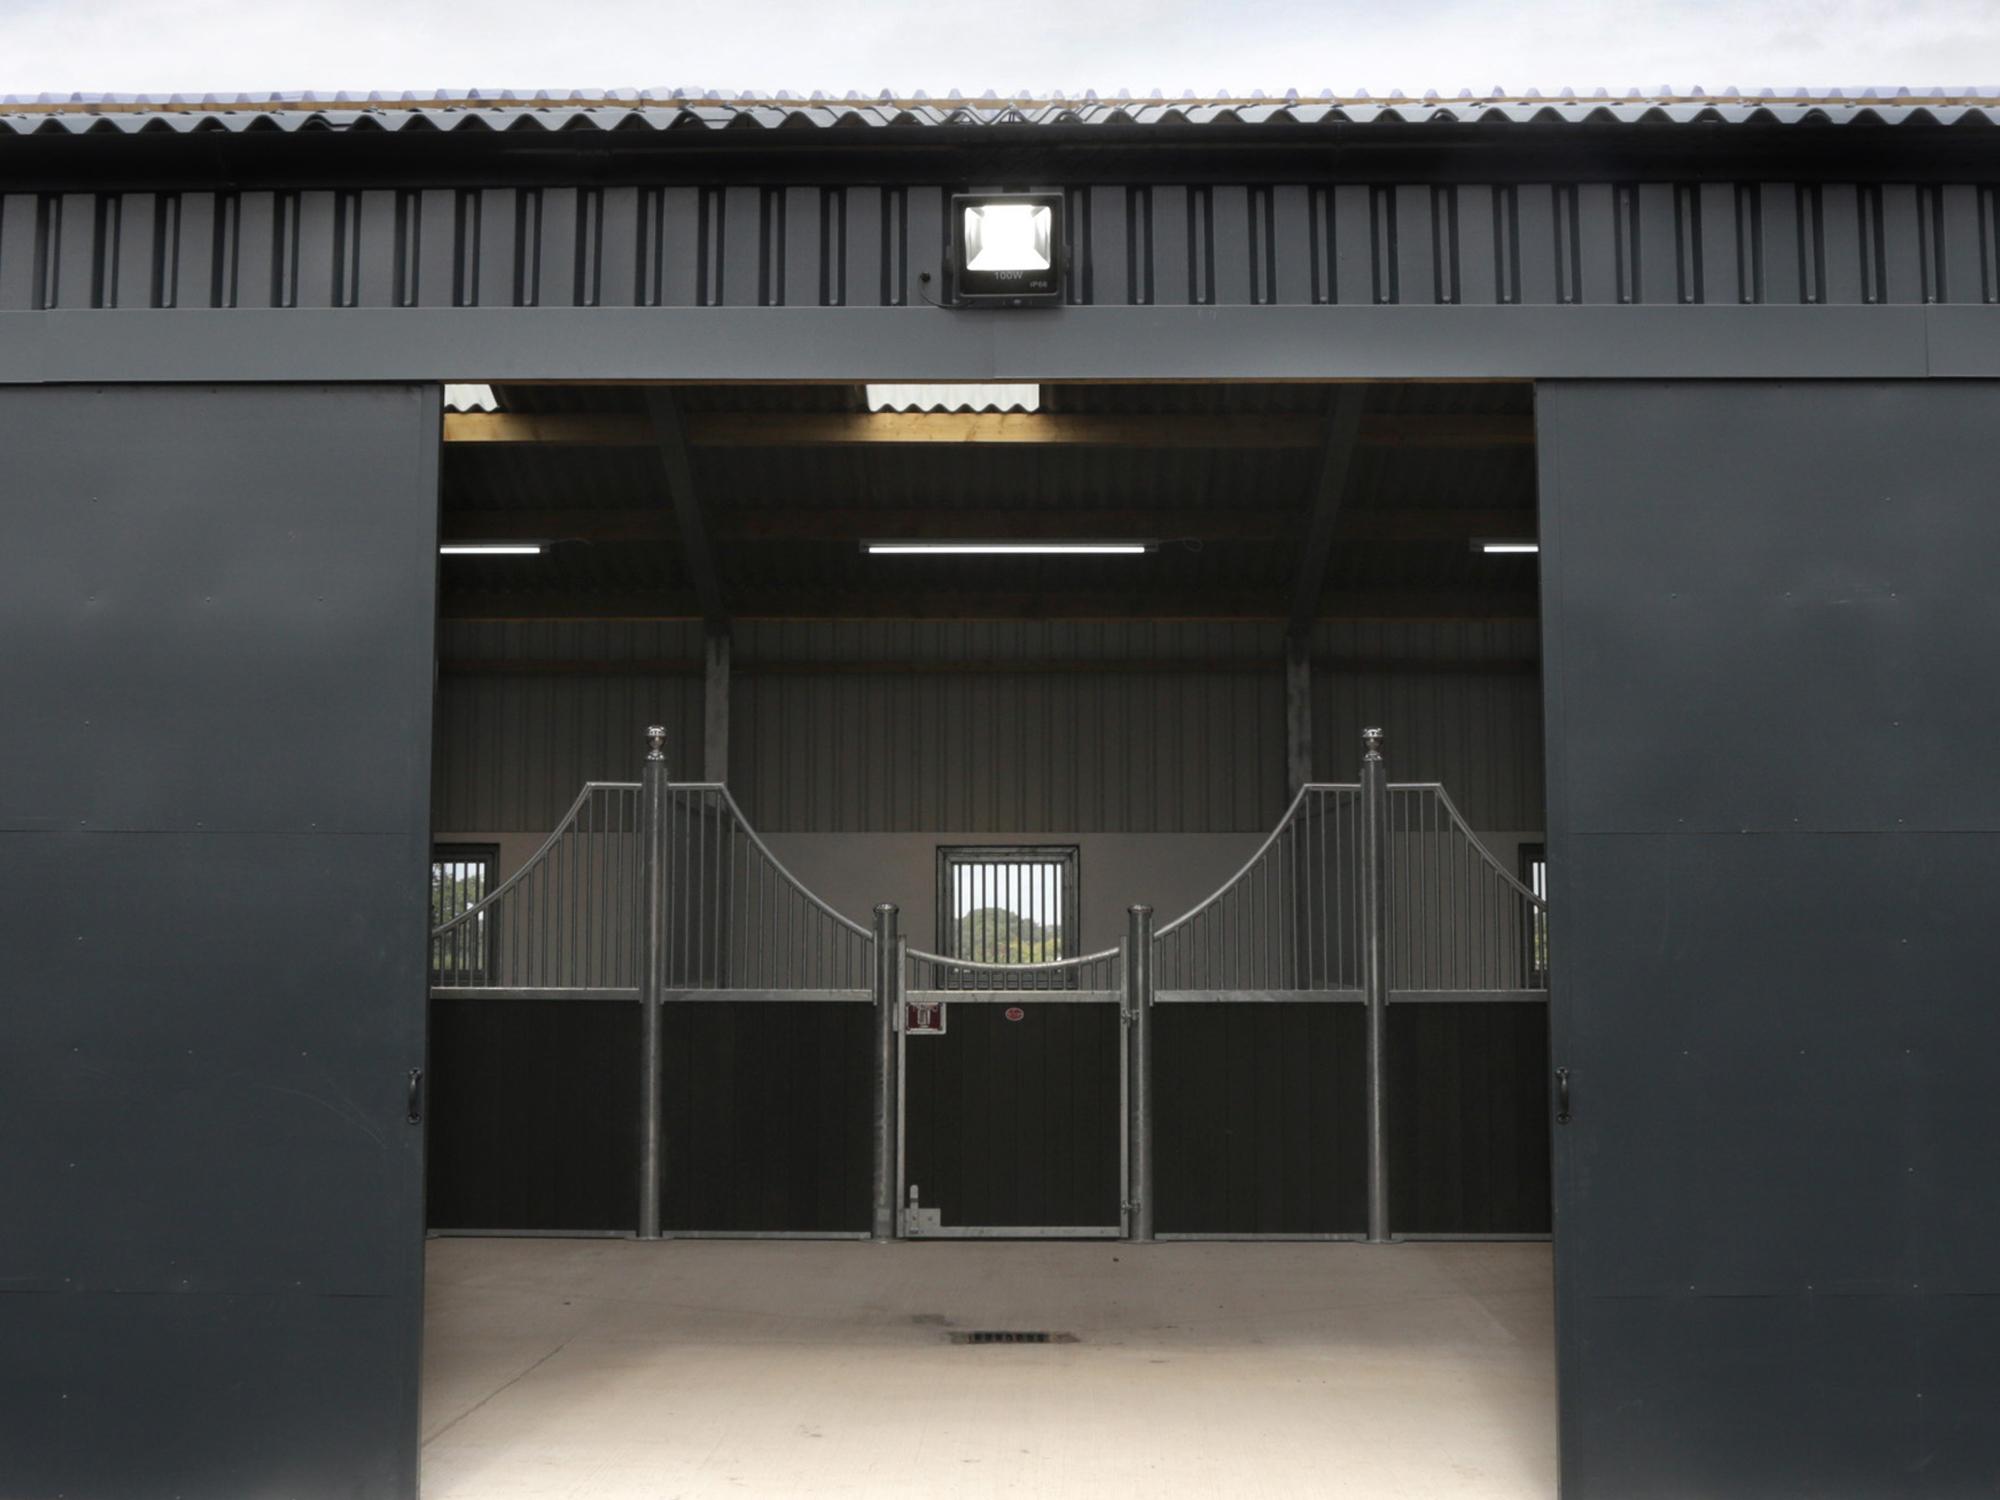 Equestrian - buildings